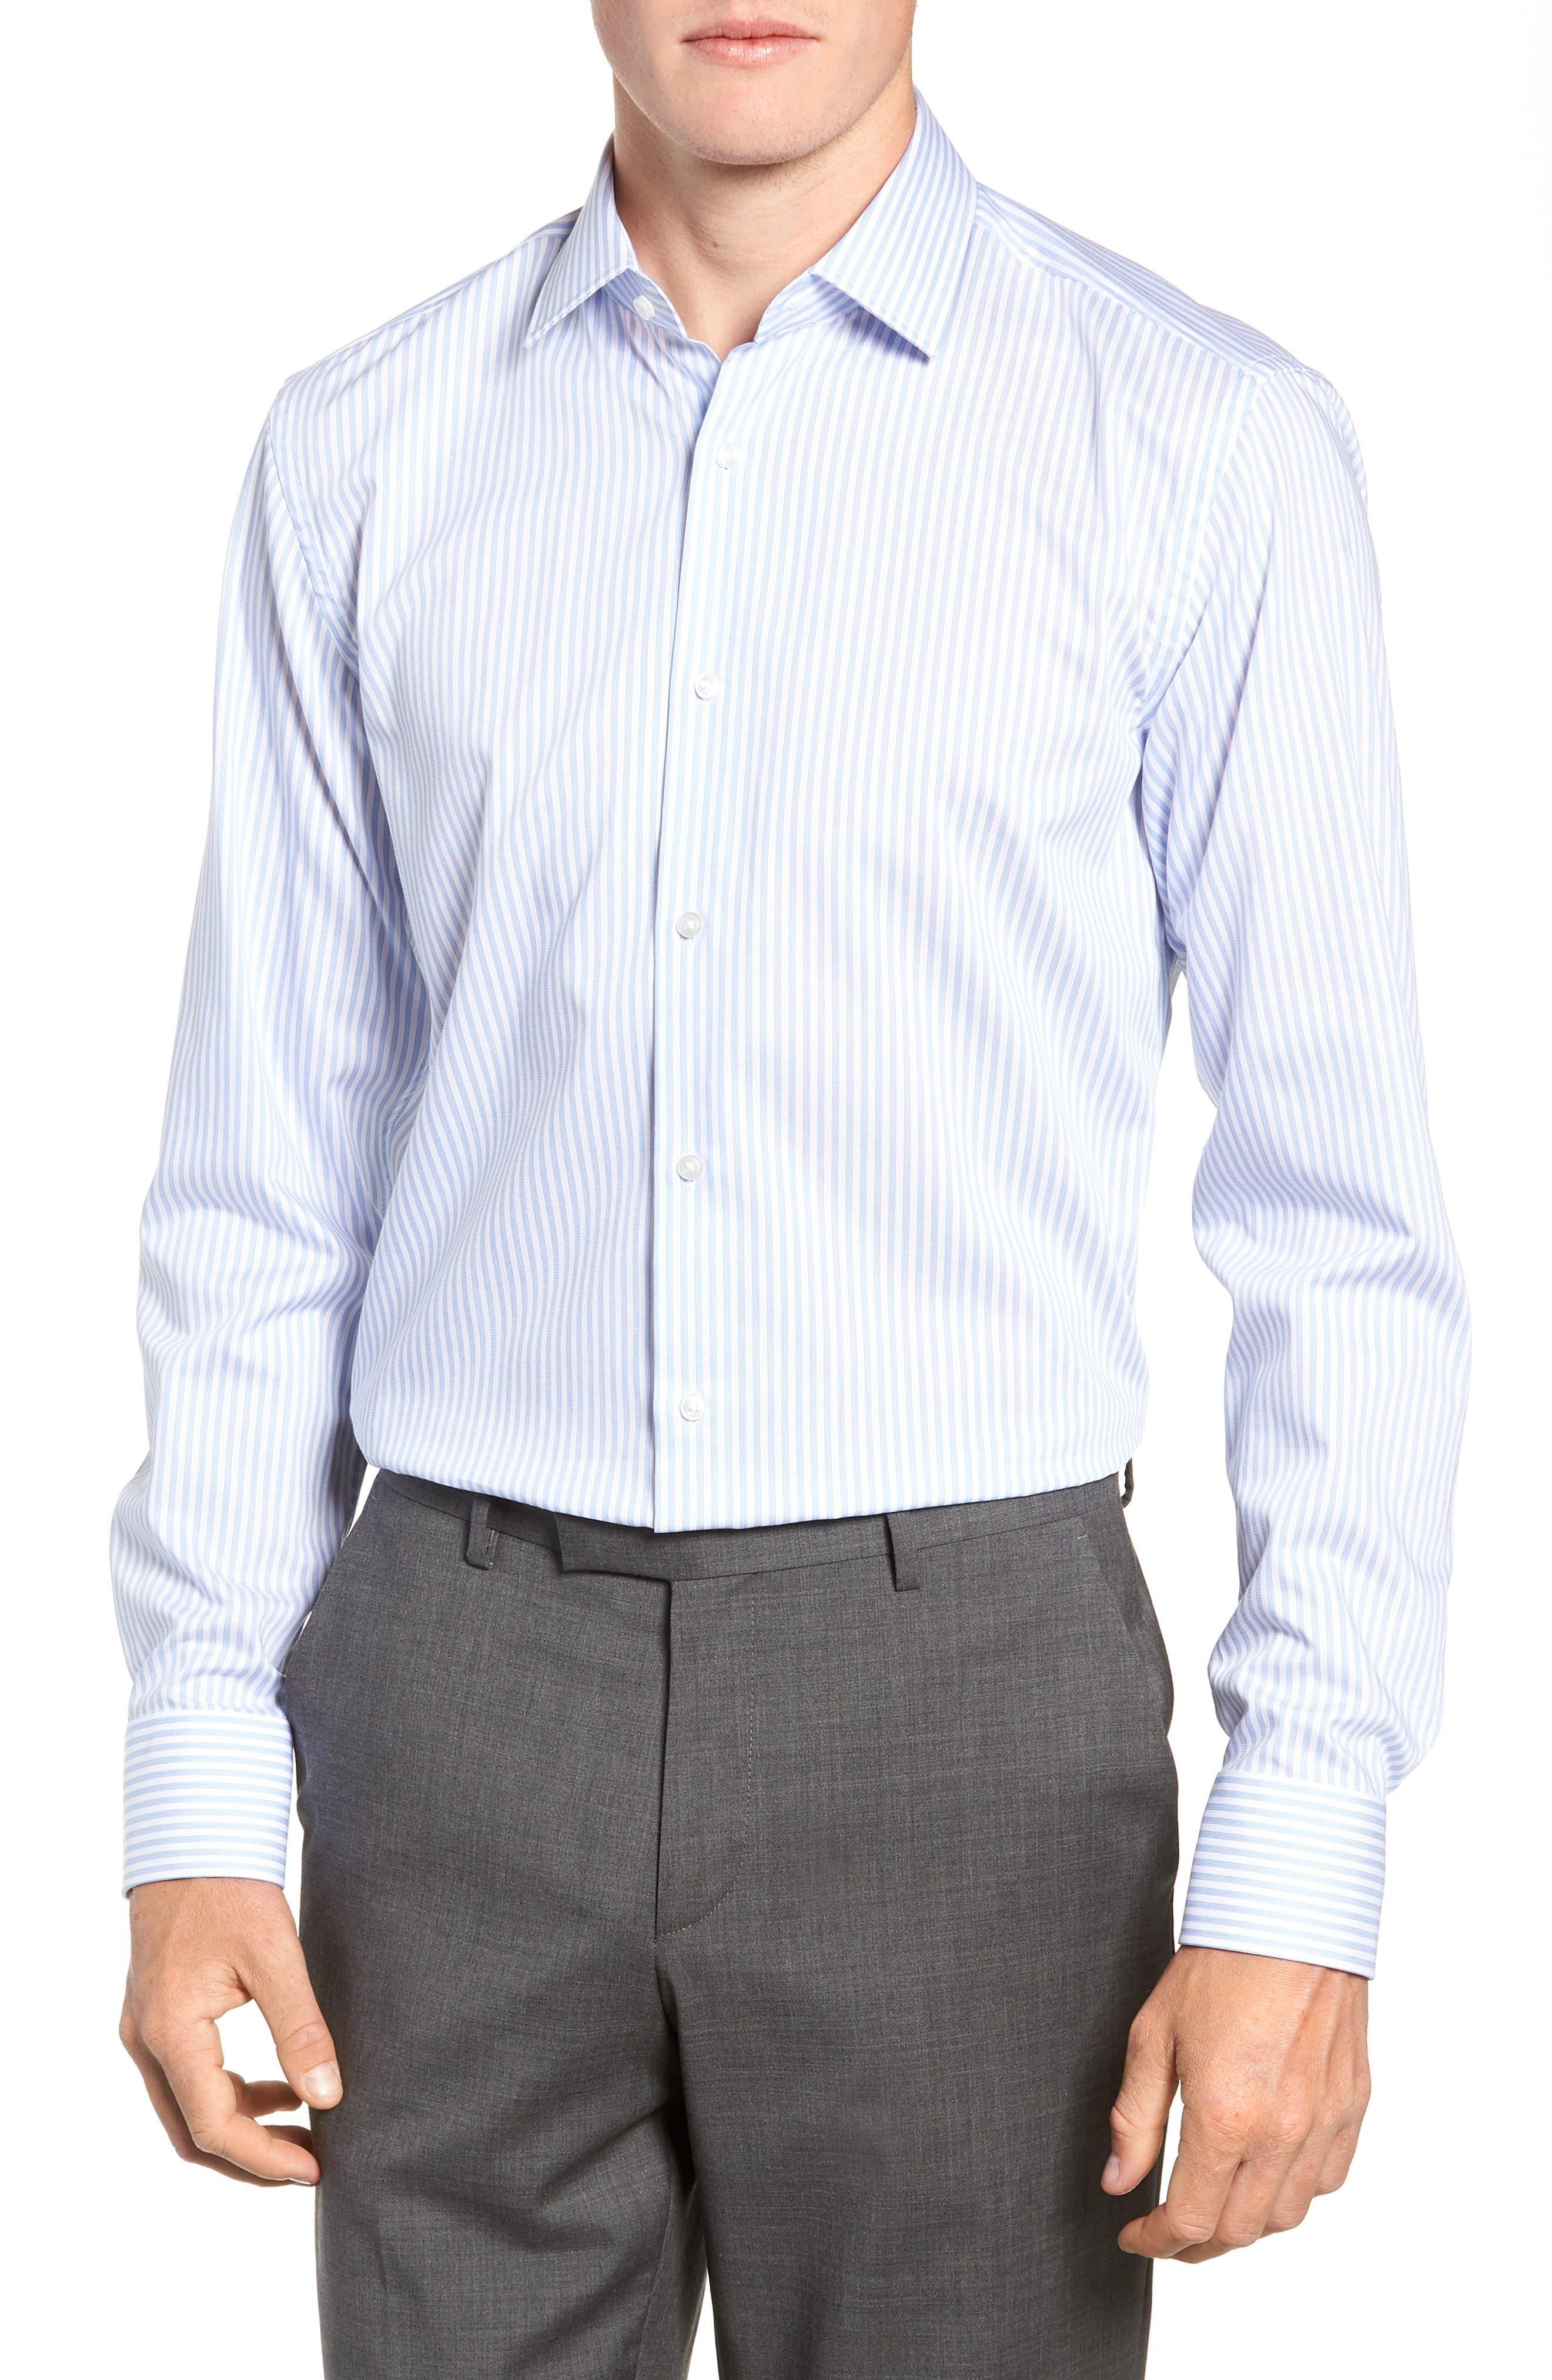 Jenno Trim Fit Stripe Dress Shirt,                         Main,                         color, BLUE